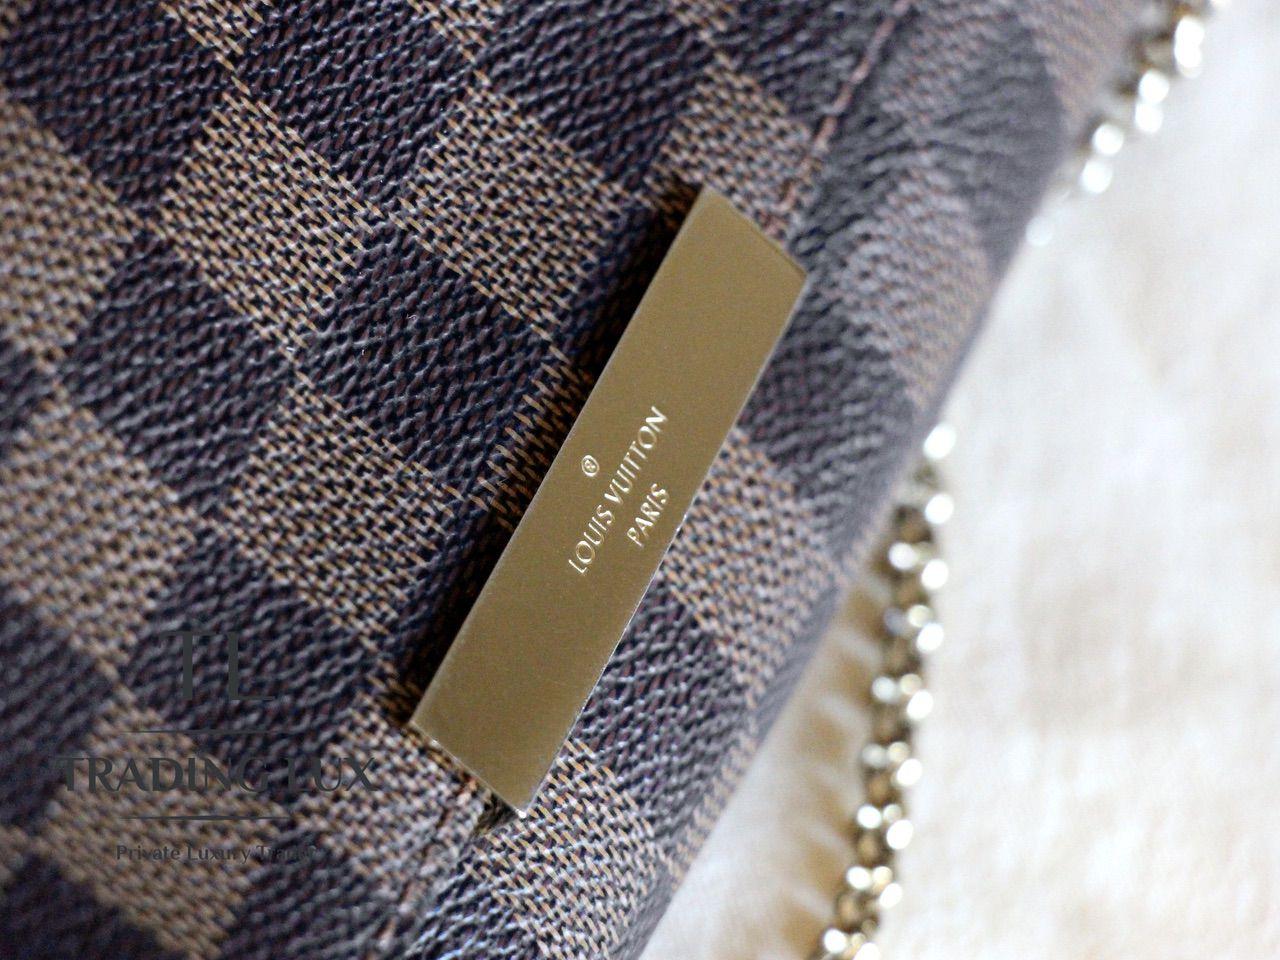 Louis-Vuitton-Favorite-6